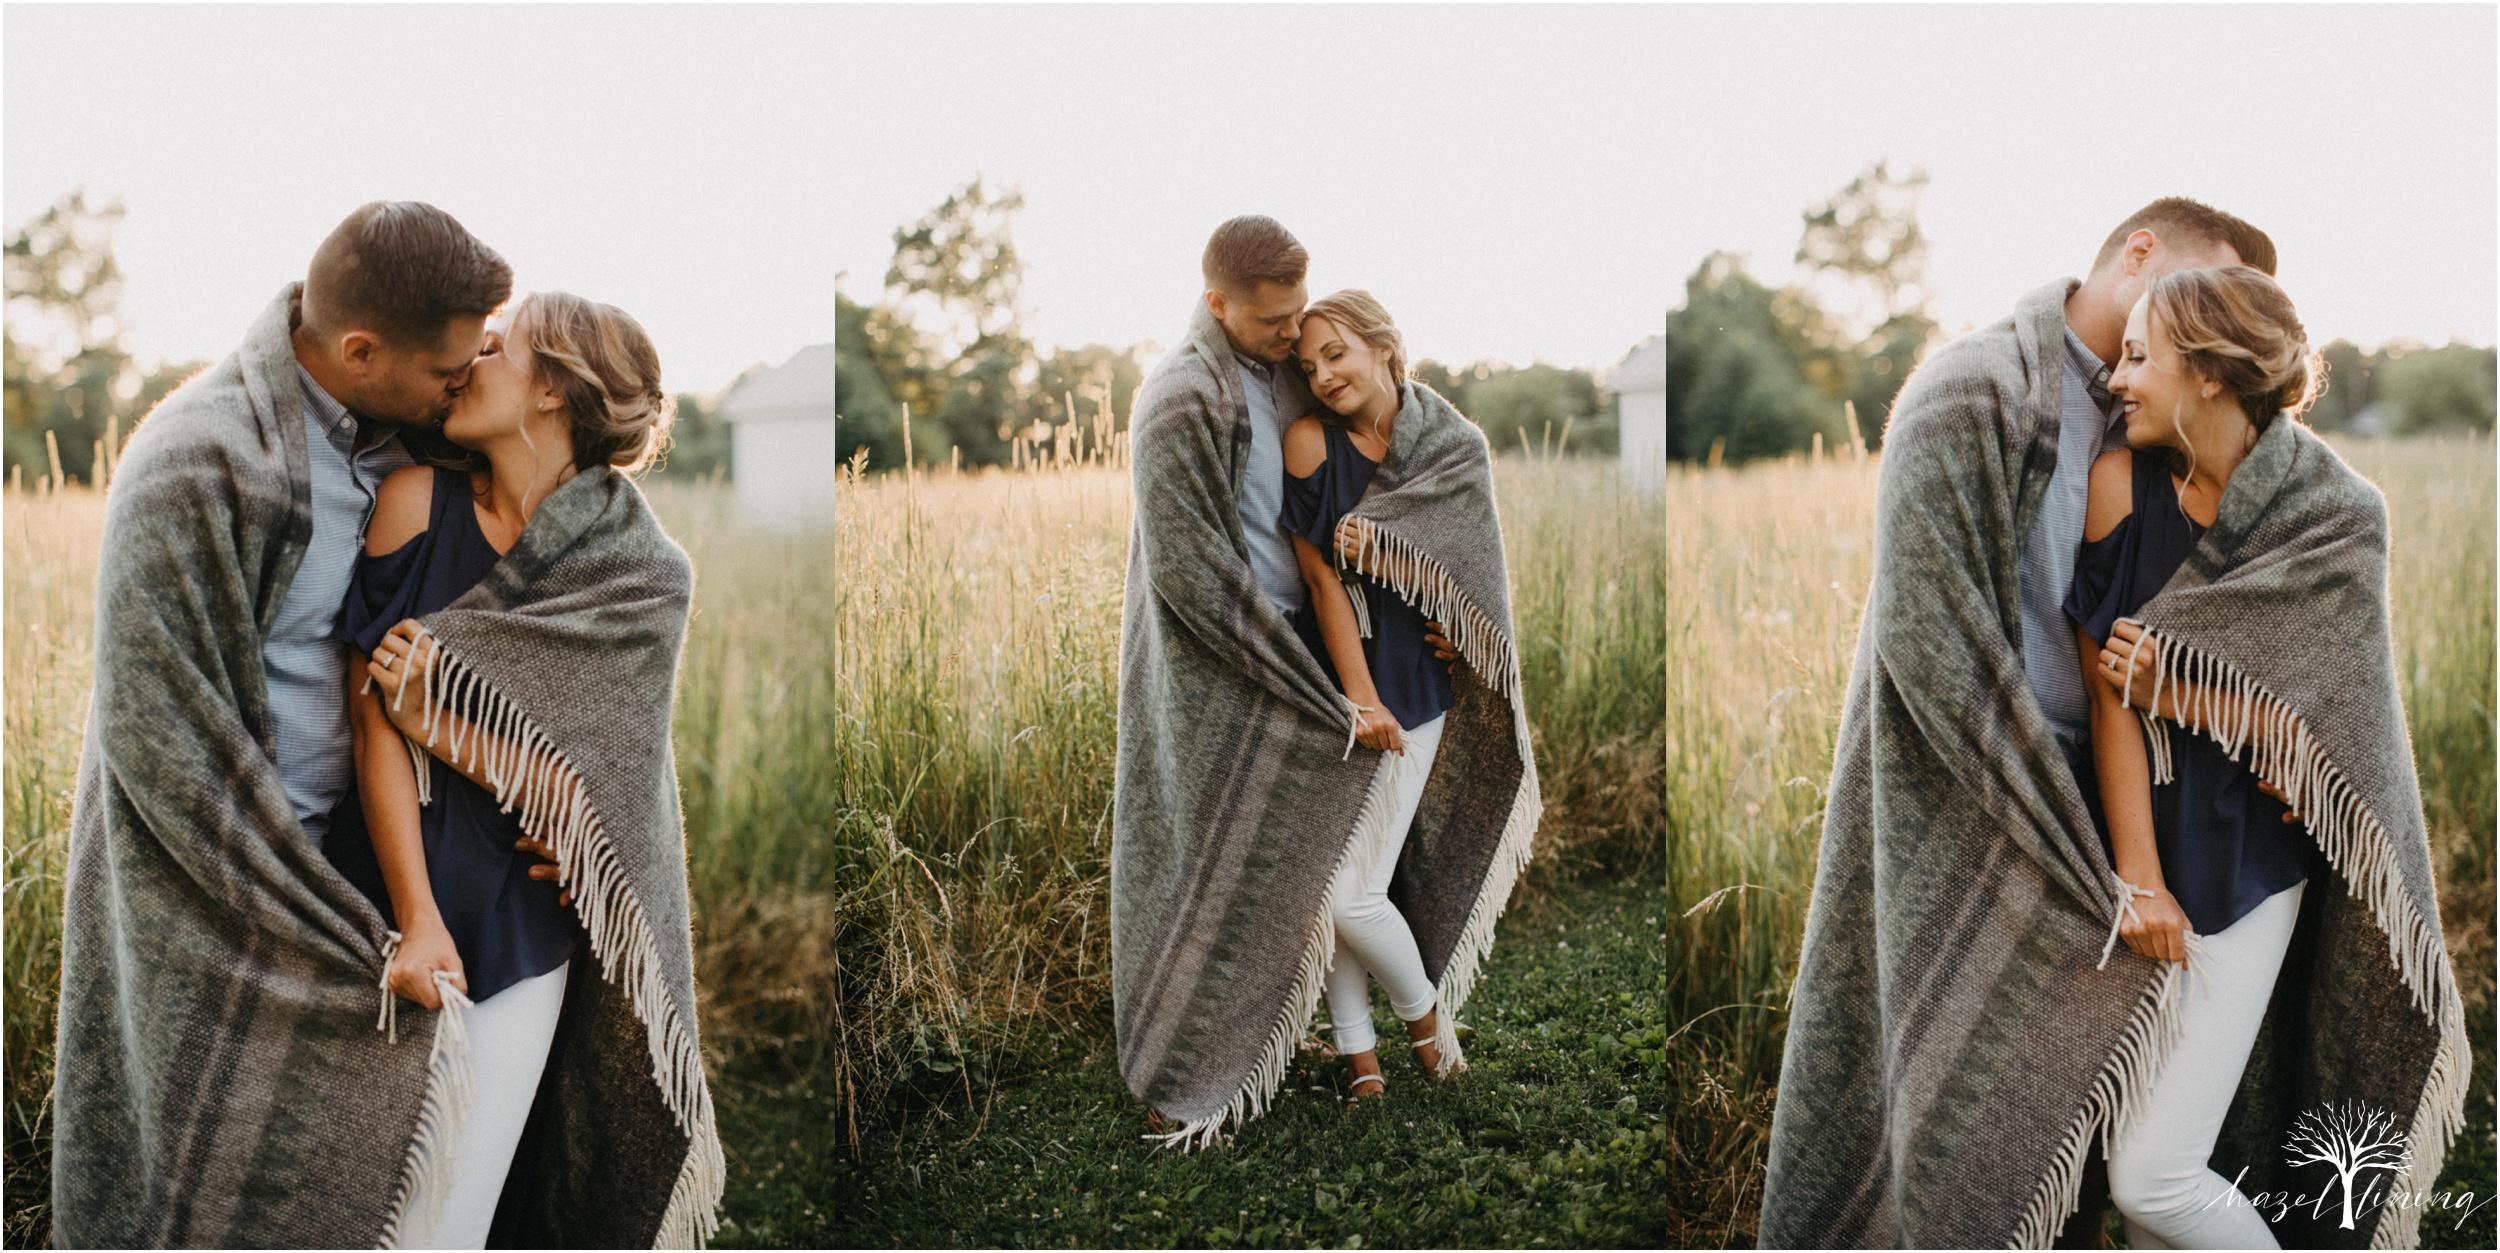 rachel-warner-chris-niedrist-the-farm-bakery-and-events-quakertown-pa-summer-engagement-hazel-lining-photography-destination-elopement-wedding-engagement-photography_0075.jpg